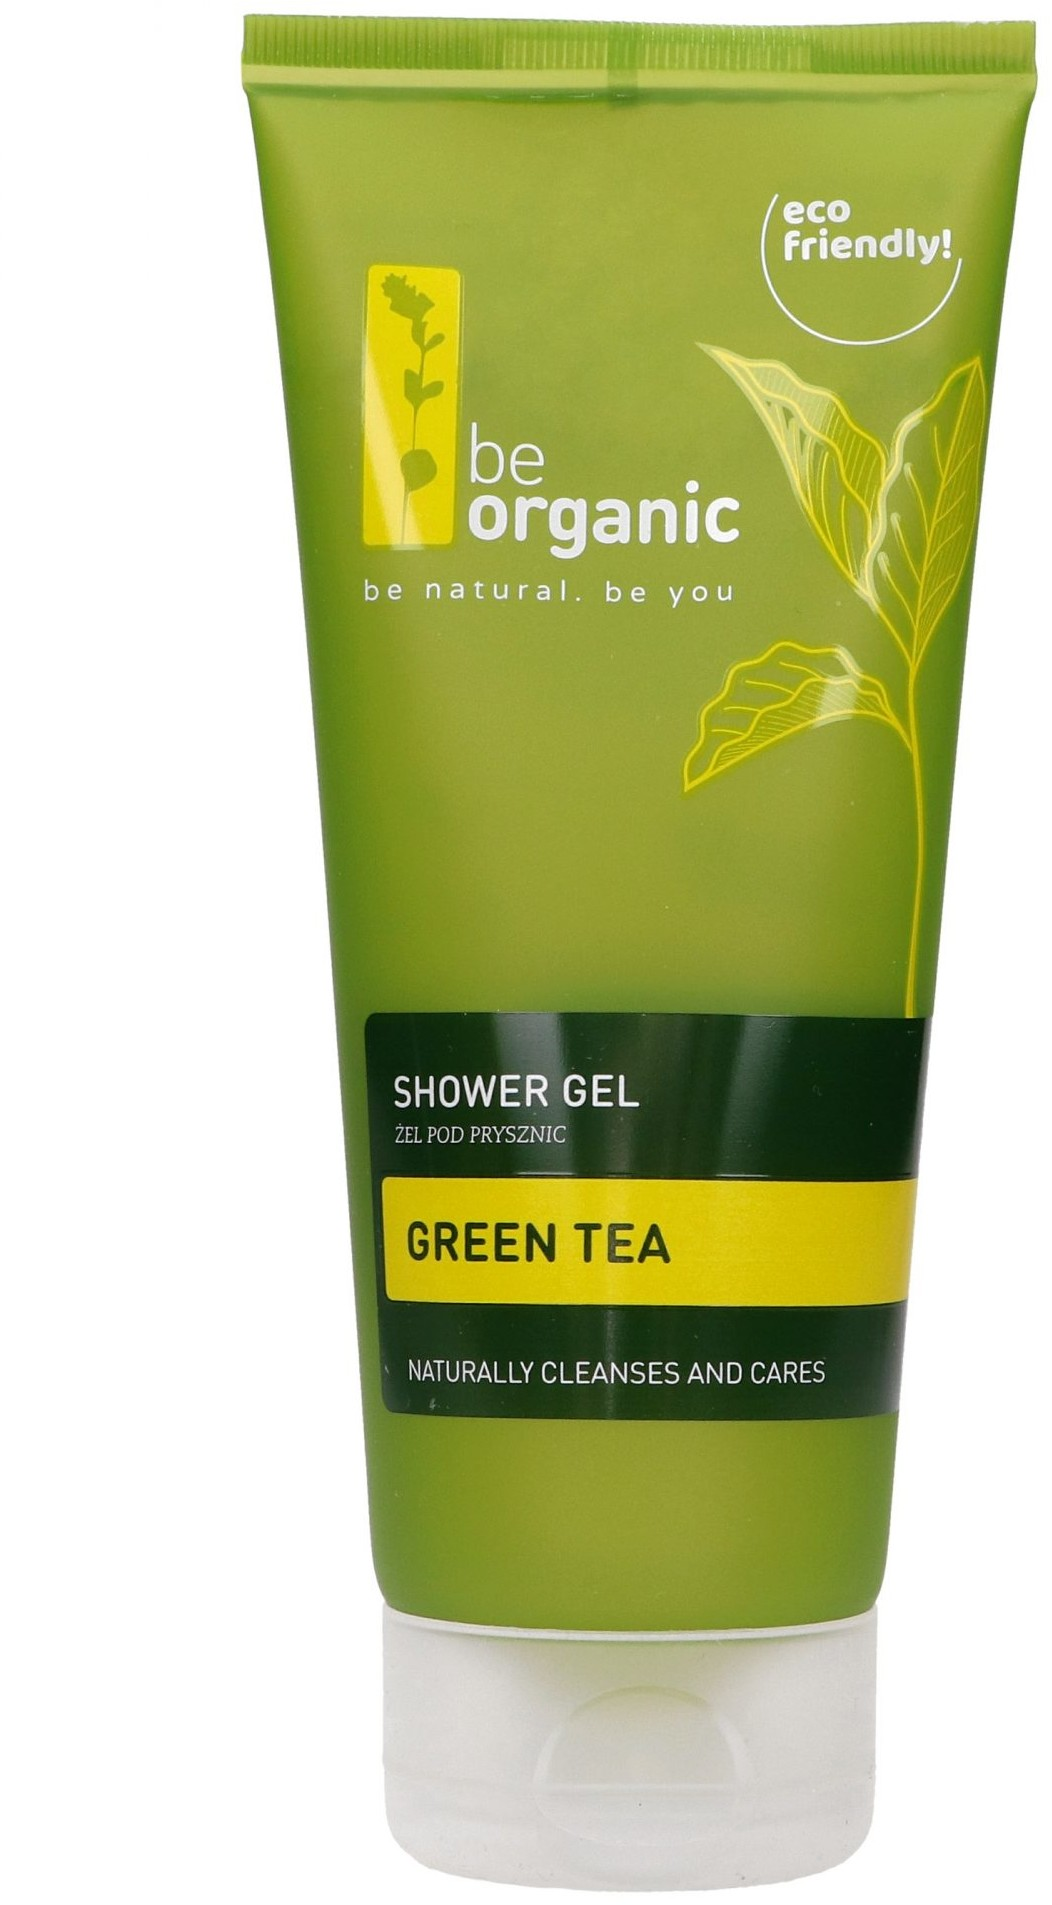 Organic Be BeOrganic, Żel pod prysznic, zielona herbata, 200ml 5905279400344